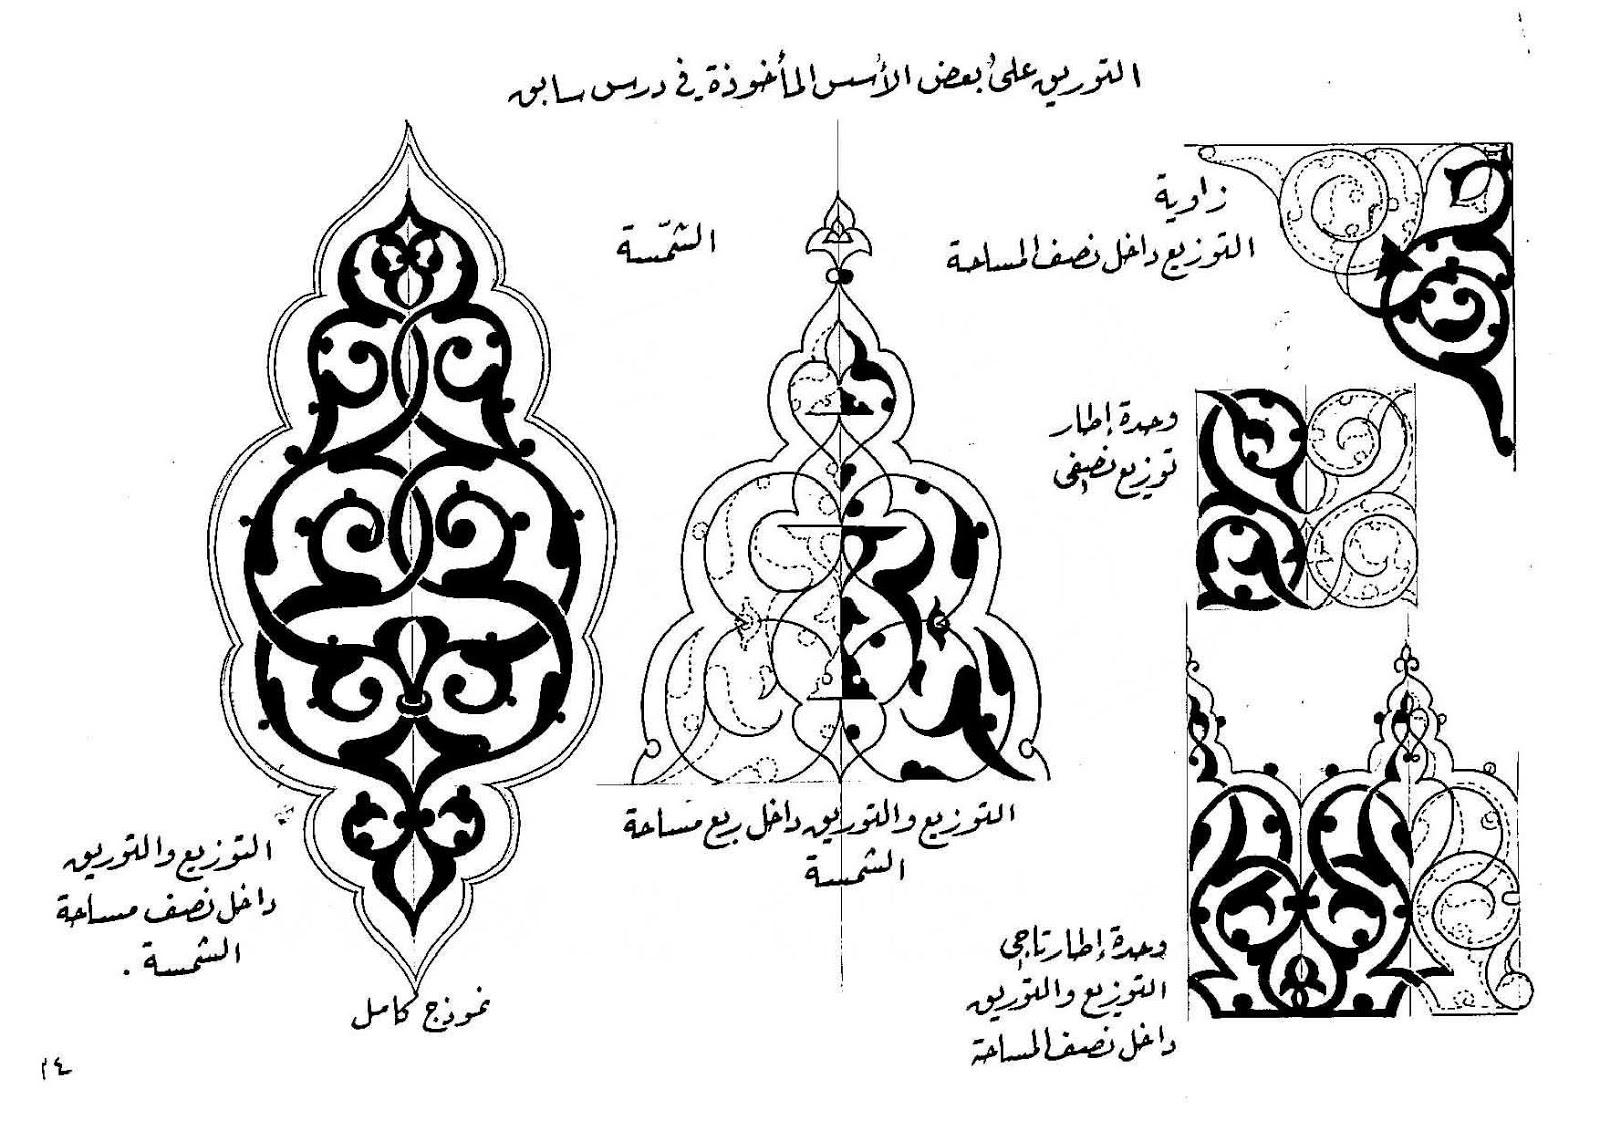 buku ornamen kaligrafi pdf guru ilmu sosial buku ornamen kaligrafi pdf guru ilmu